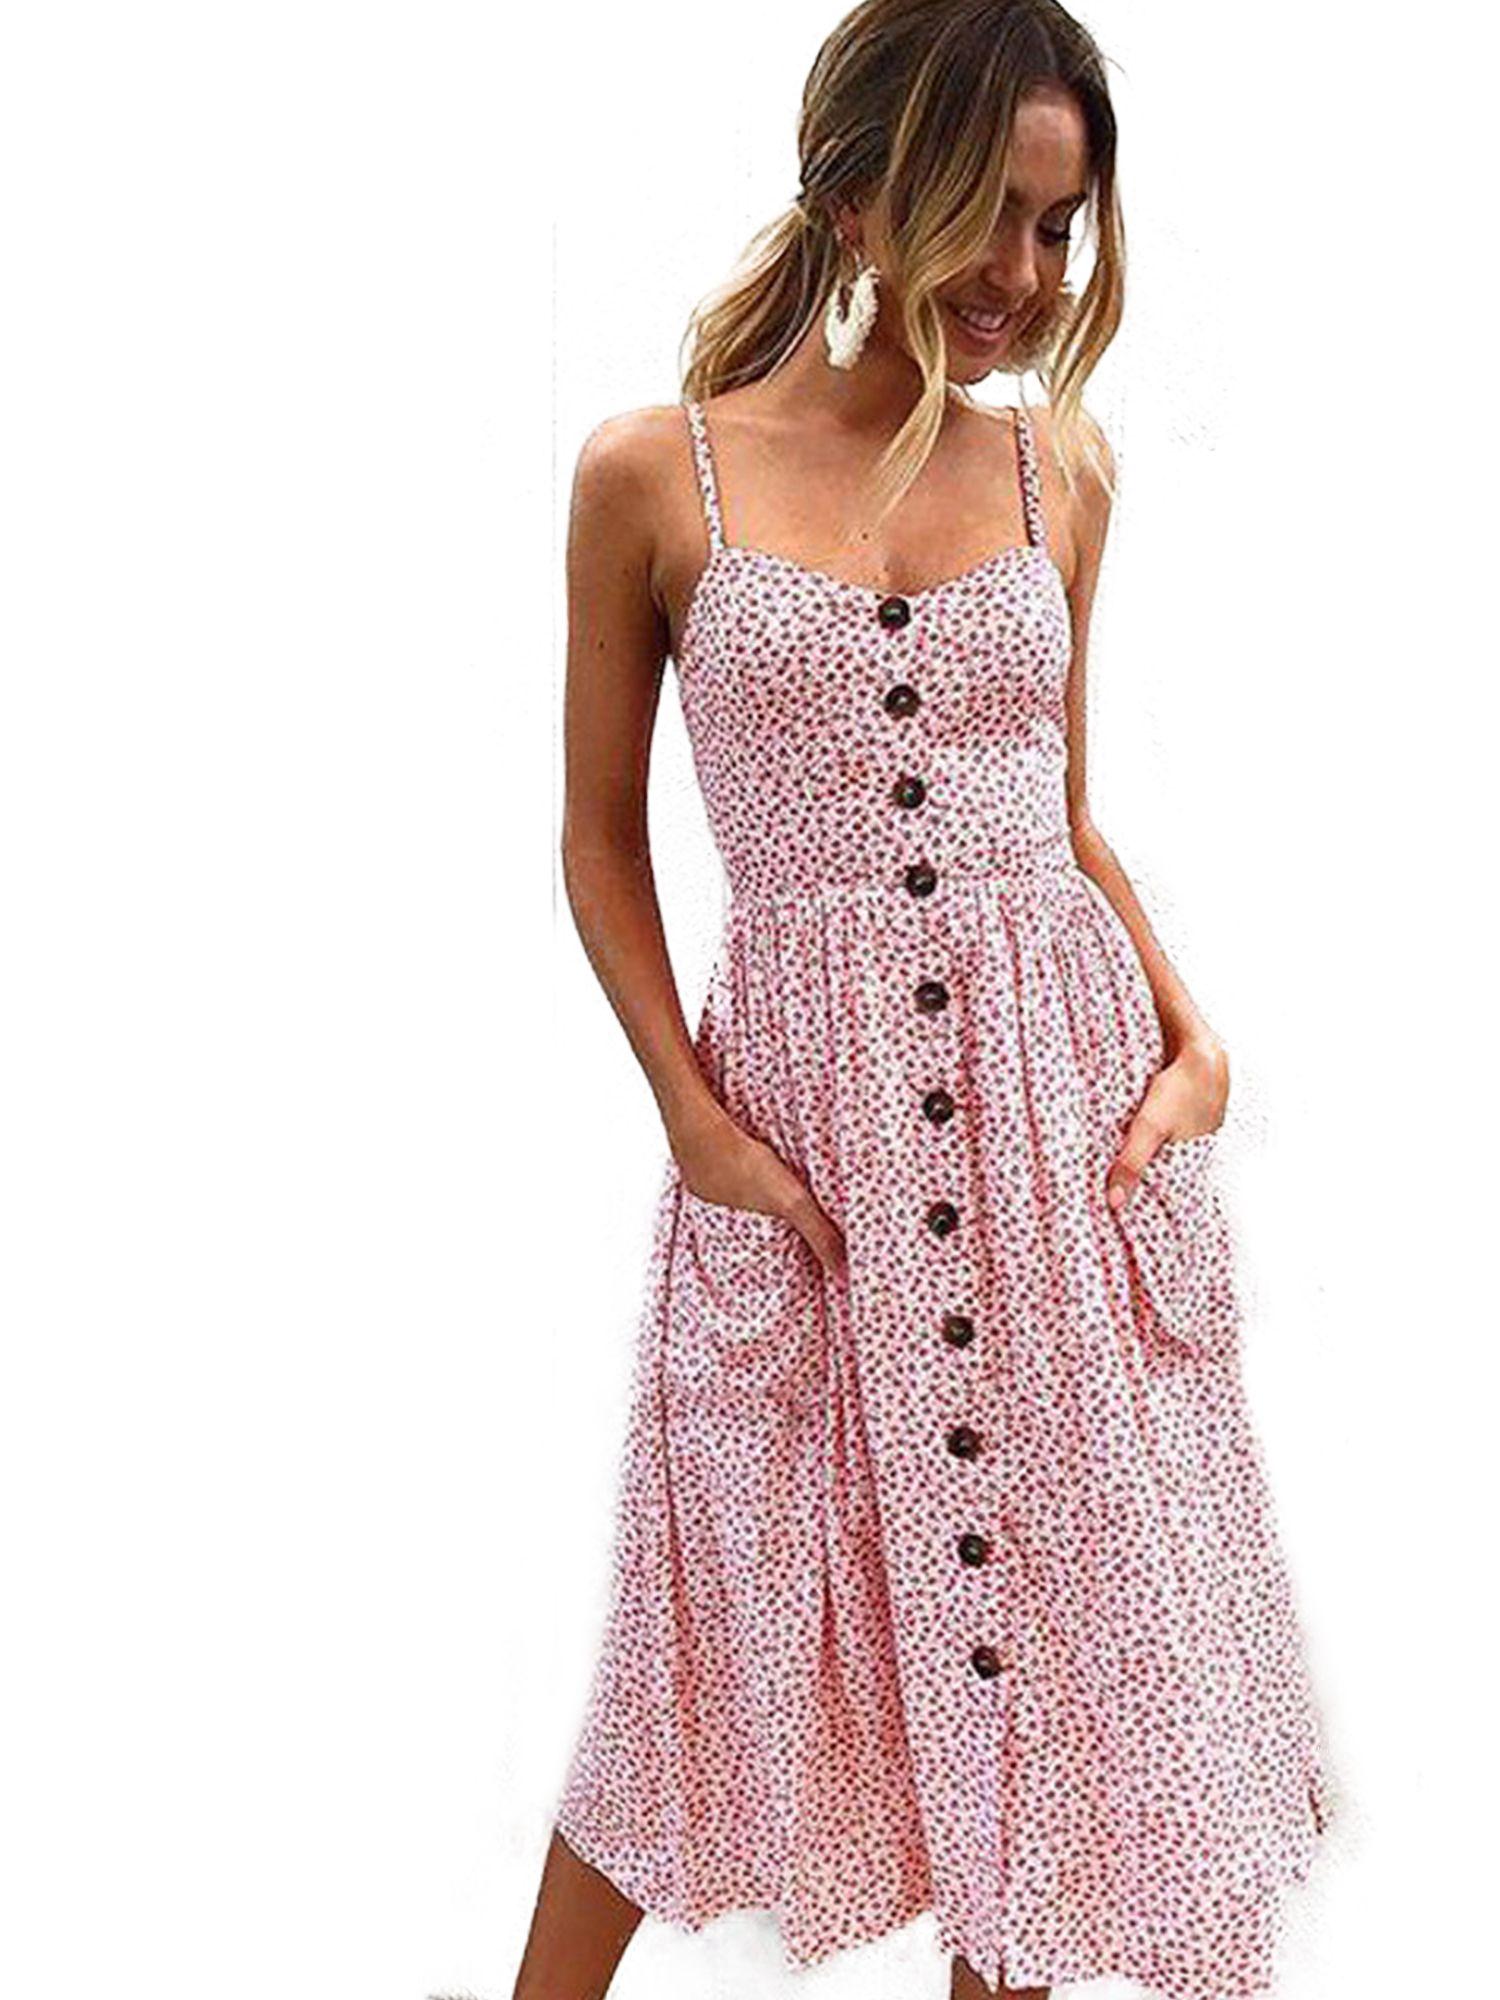 Wodstyle Women S Strappy Floral Summer Beach Party Midi Swing Dress Walmart Com Casual Dresses Boho Midi Dress Cheap Summer Dresses [ 2000 x 1500 Pixel ]